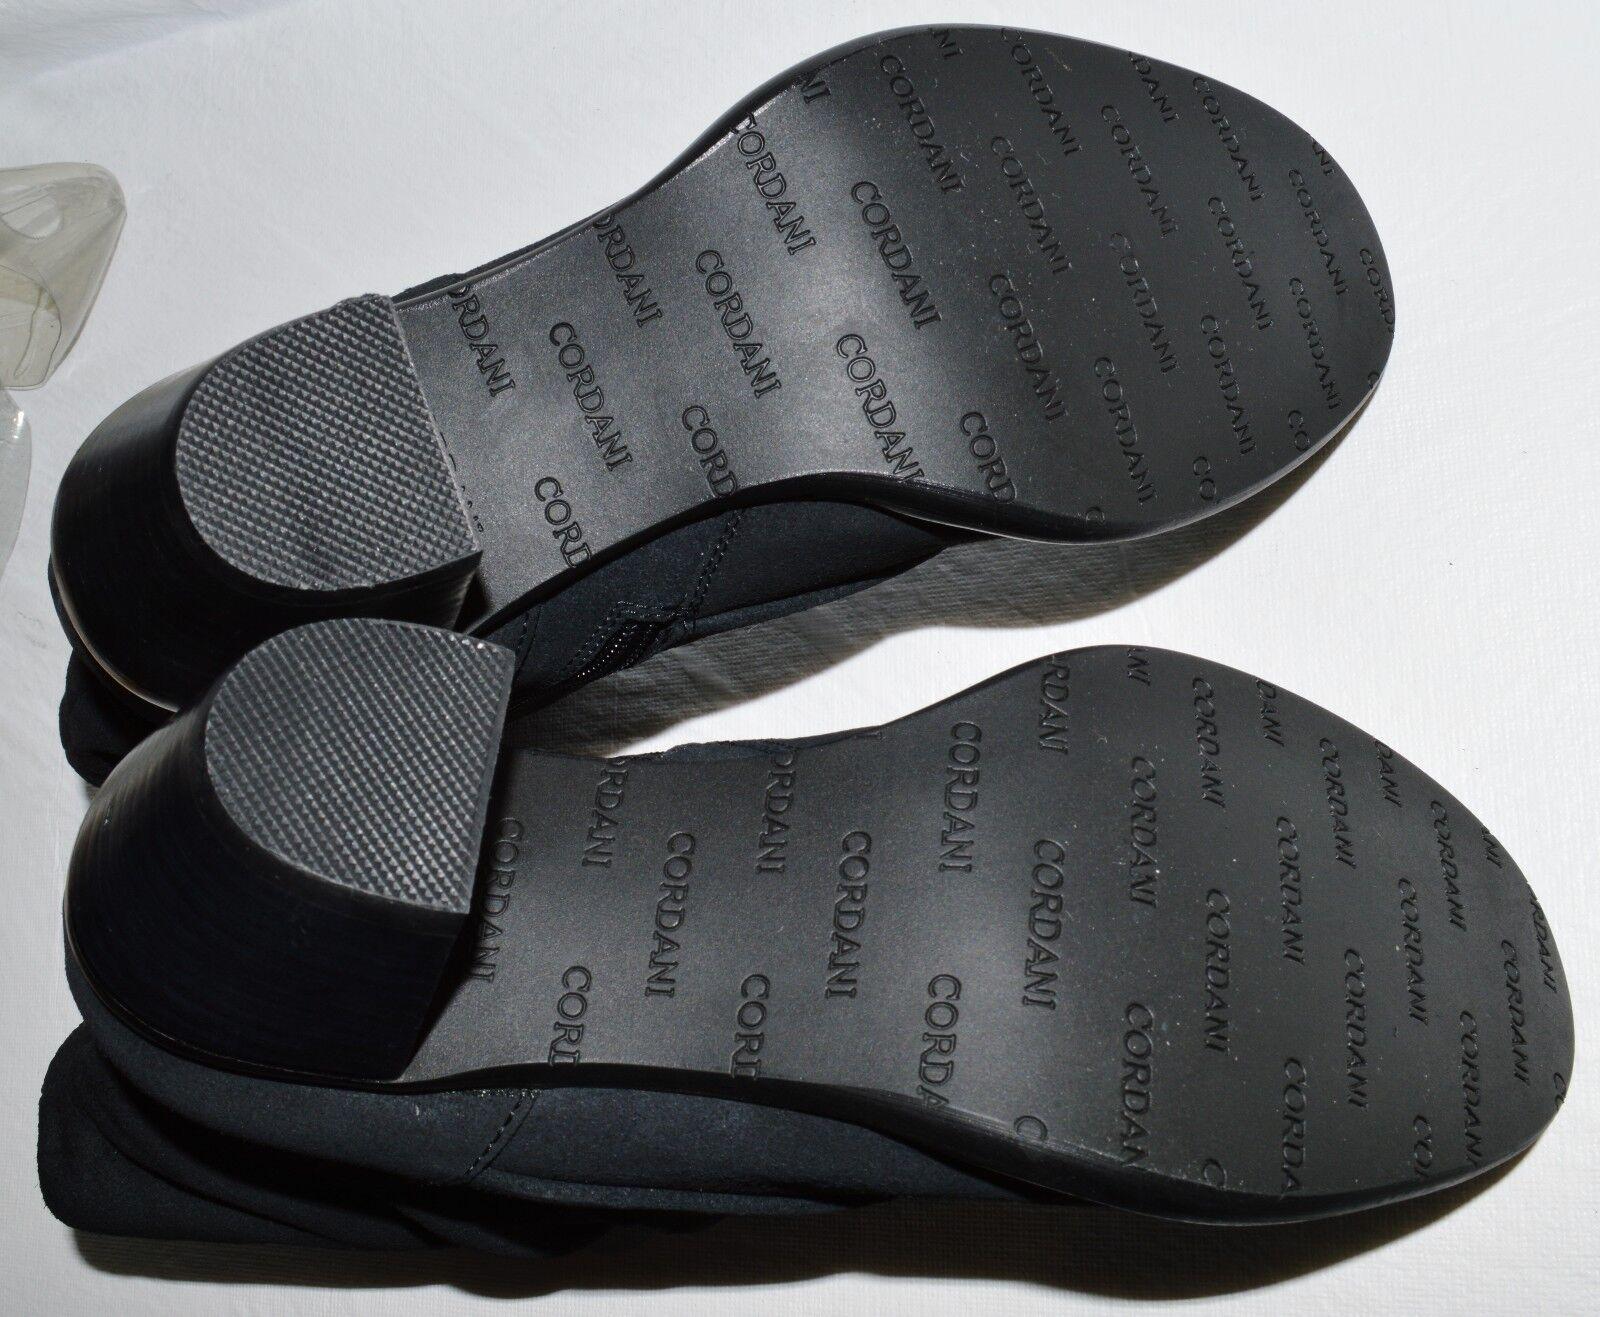 CORDANI CALZATURE UMBER NIB  310 310 310 SZ 6.5 M 37 BLACK SUEDE ANKLE BOOTS BOOTIES c95b12